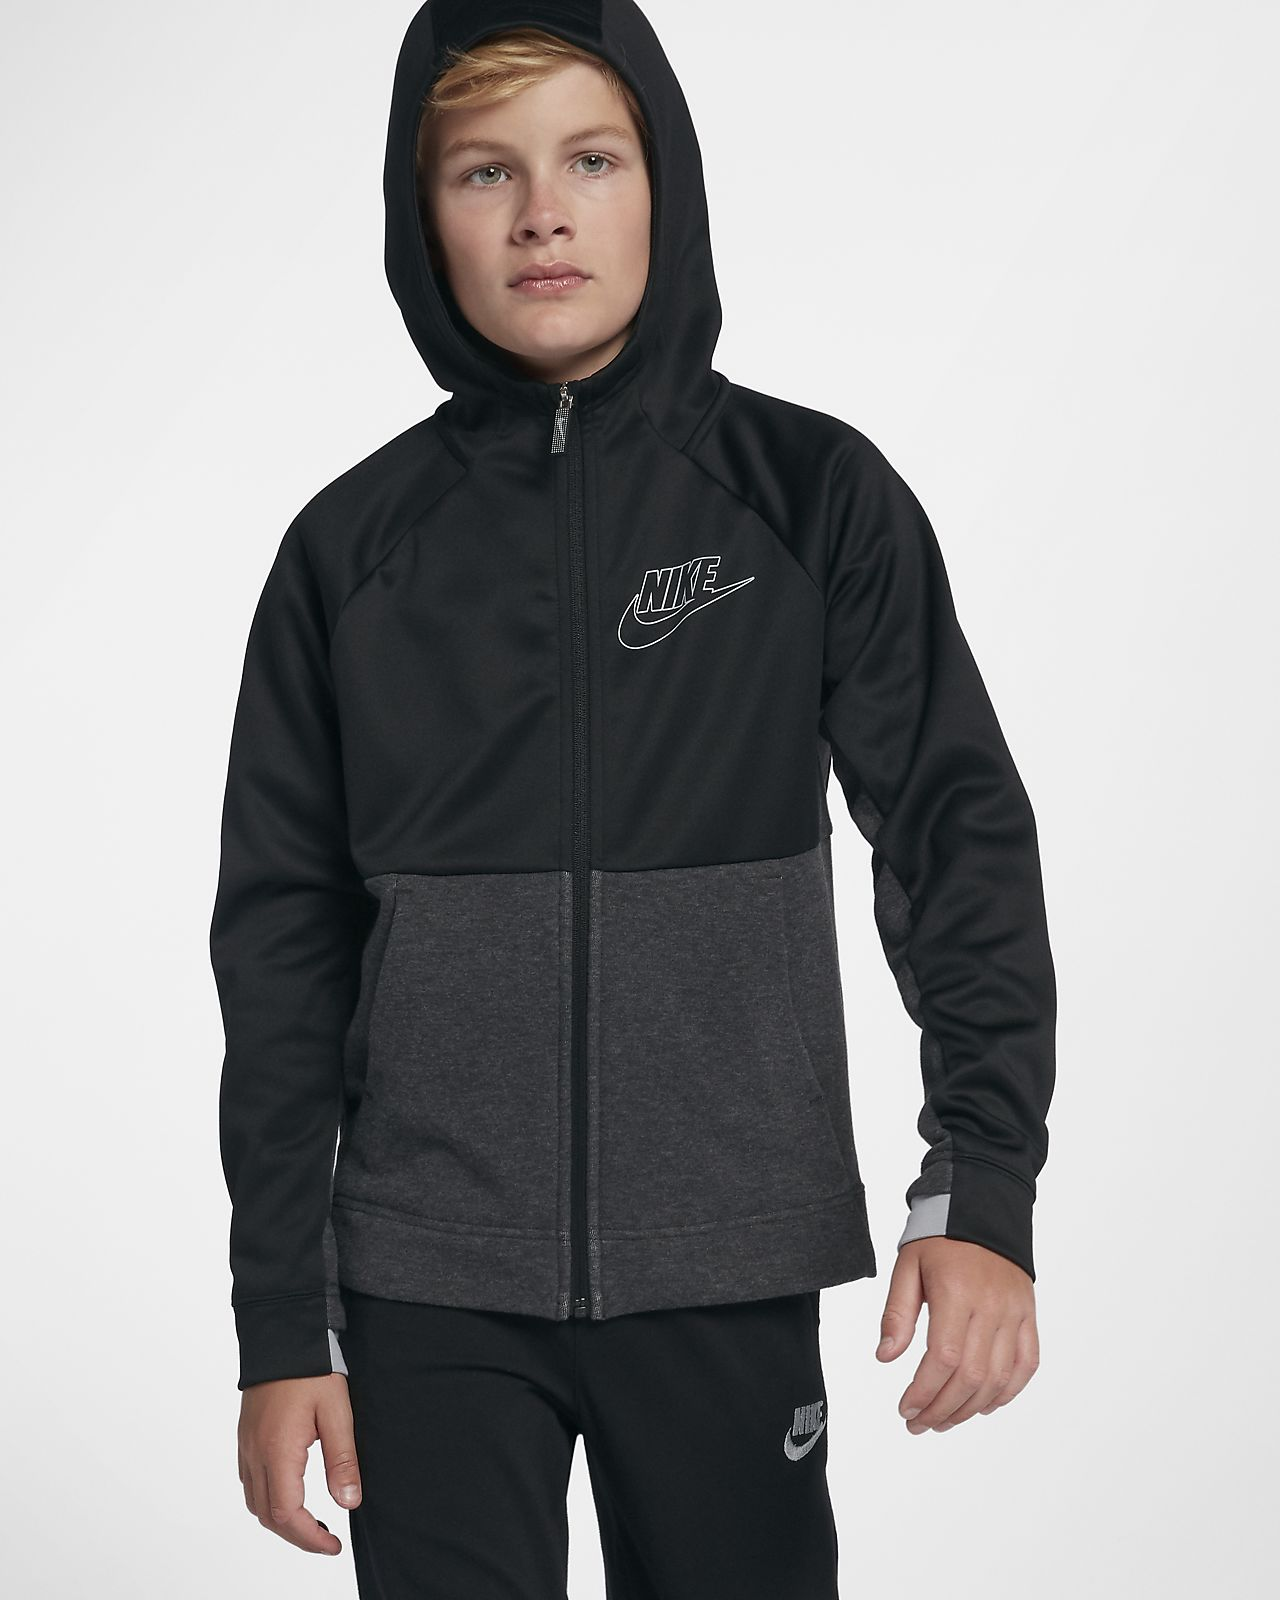 110eb6ef4 Sudadera con capucha para ninos talla grande Nike Sportswear My Nike ...